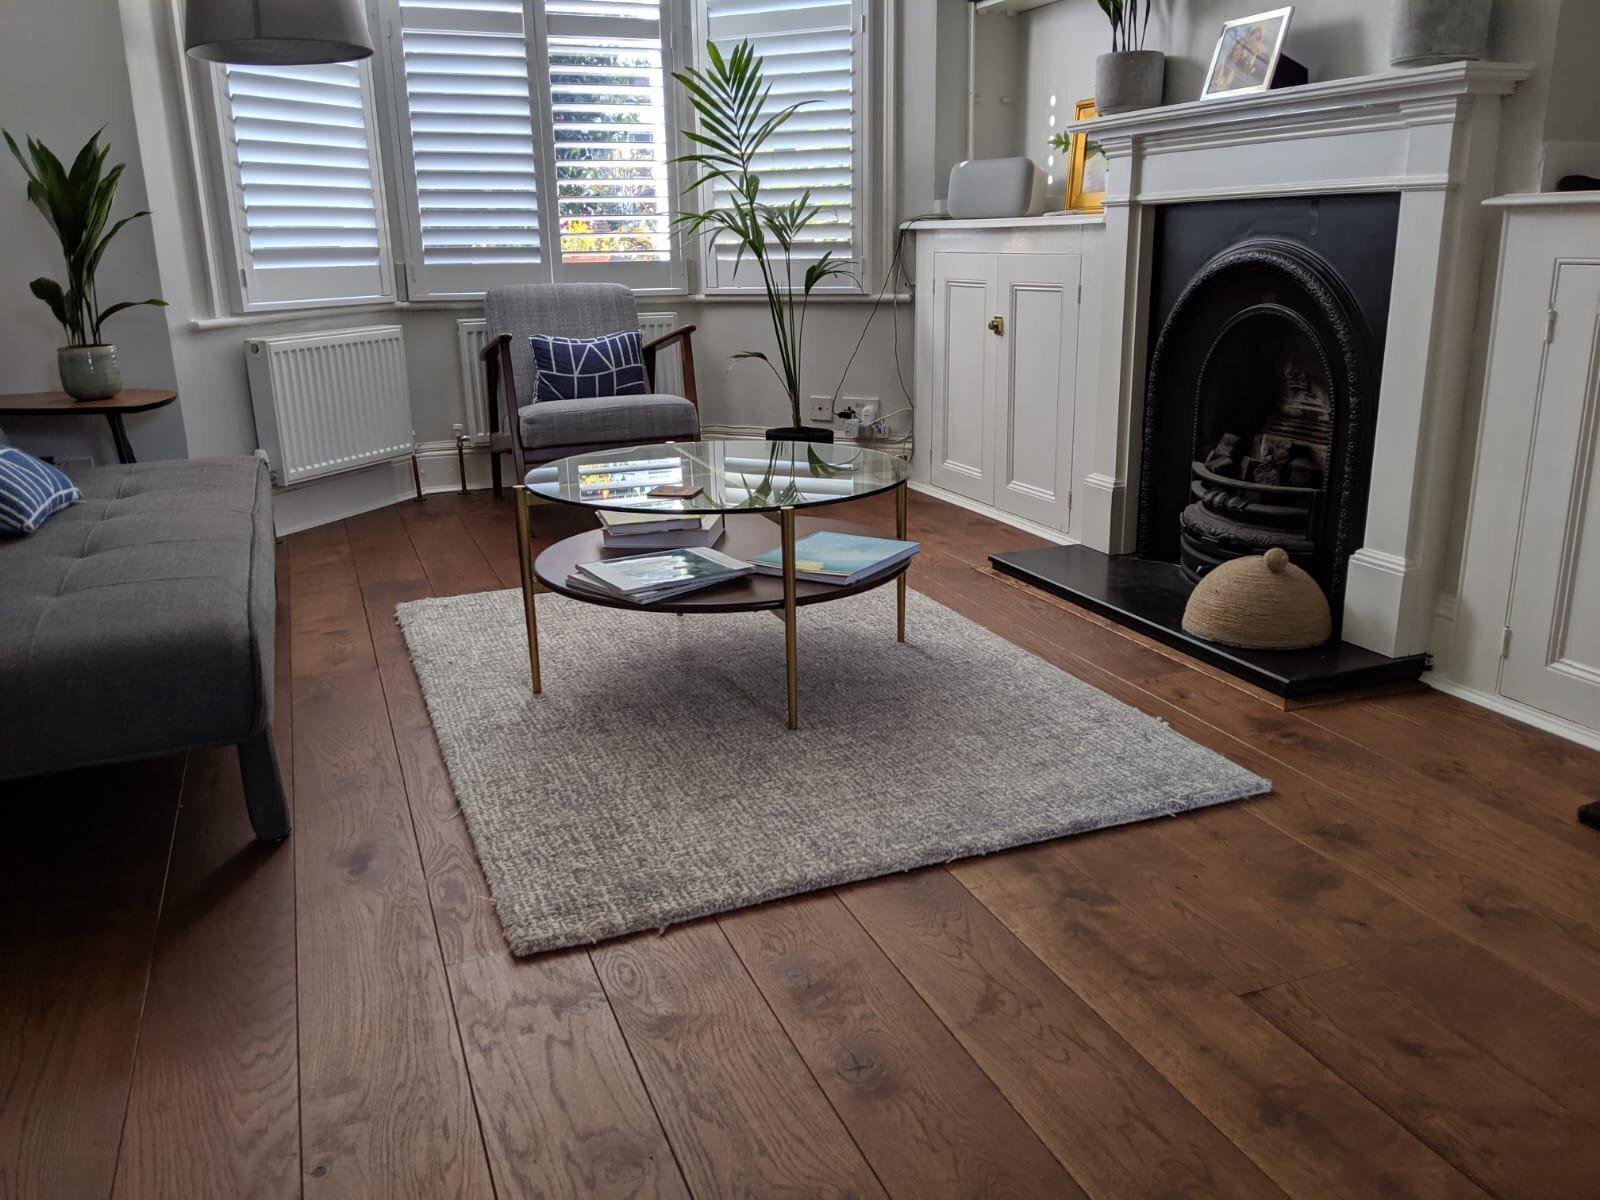 wooden floors south london club